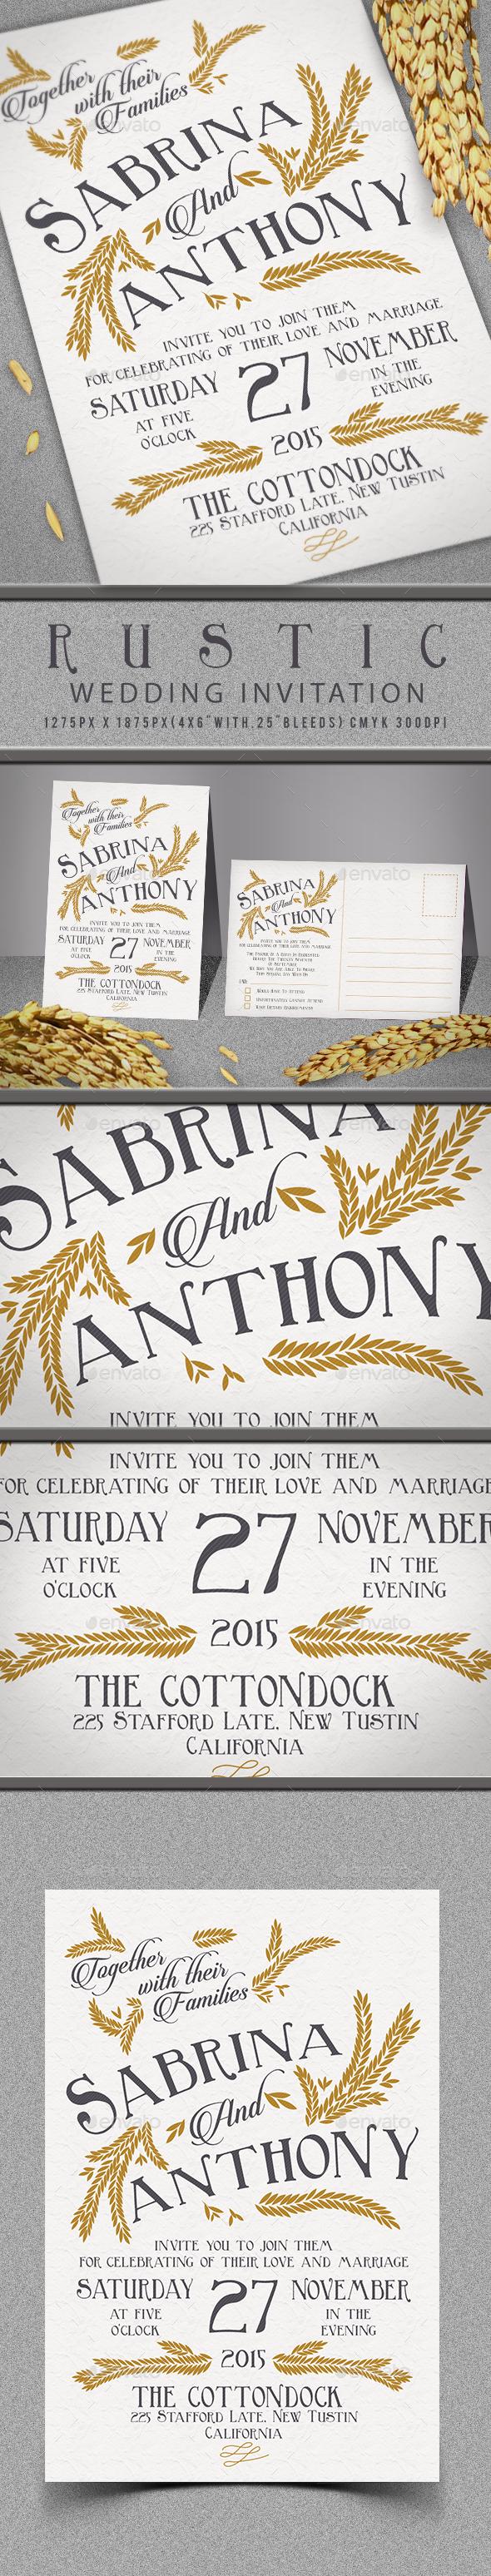 Rustic Wedding Invitation - Invitations Cards & Invites